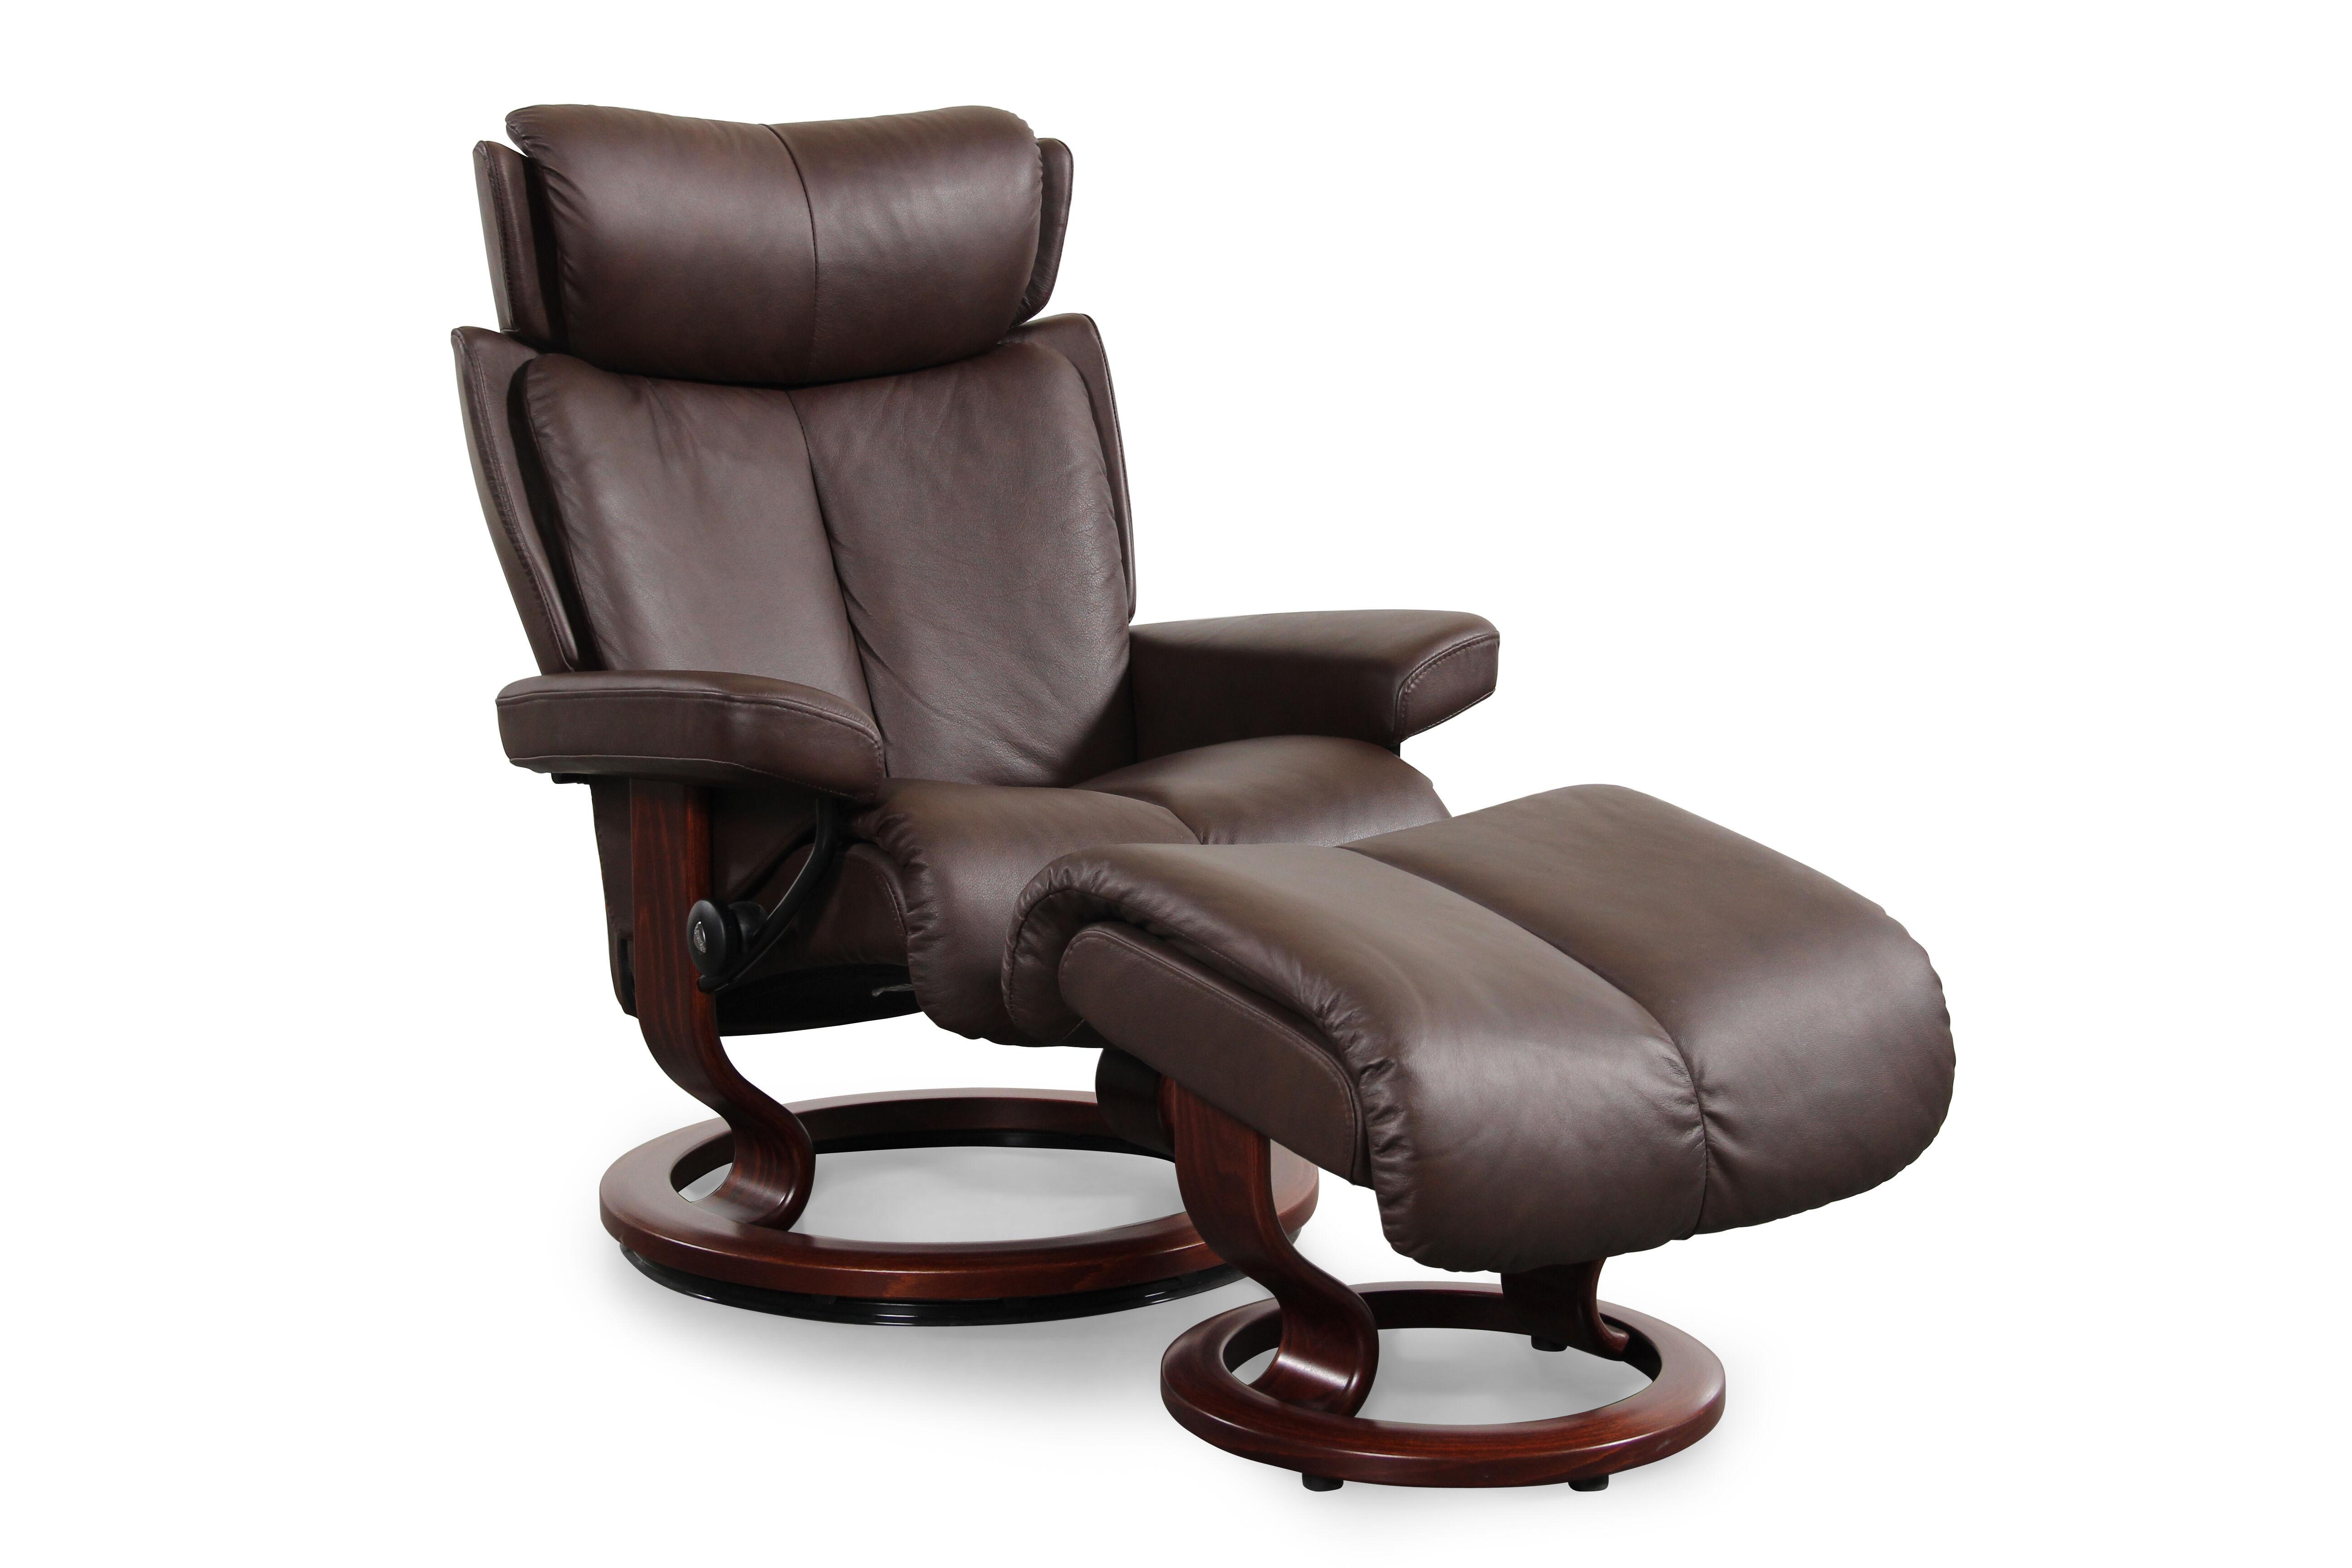 stressless chairs chair covers wedding hull magic paloma medium chocolate and ottoman